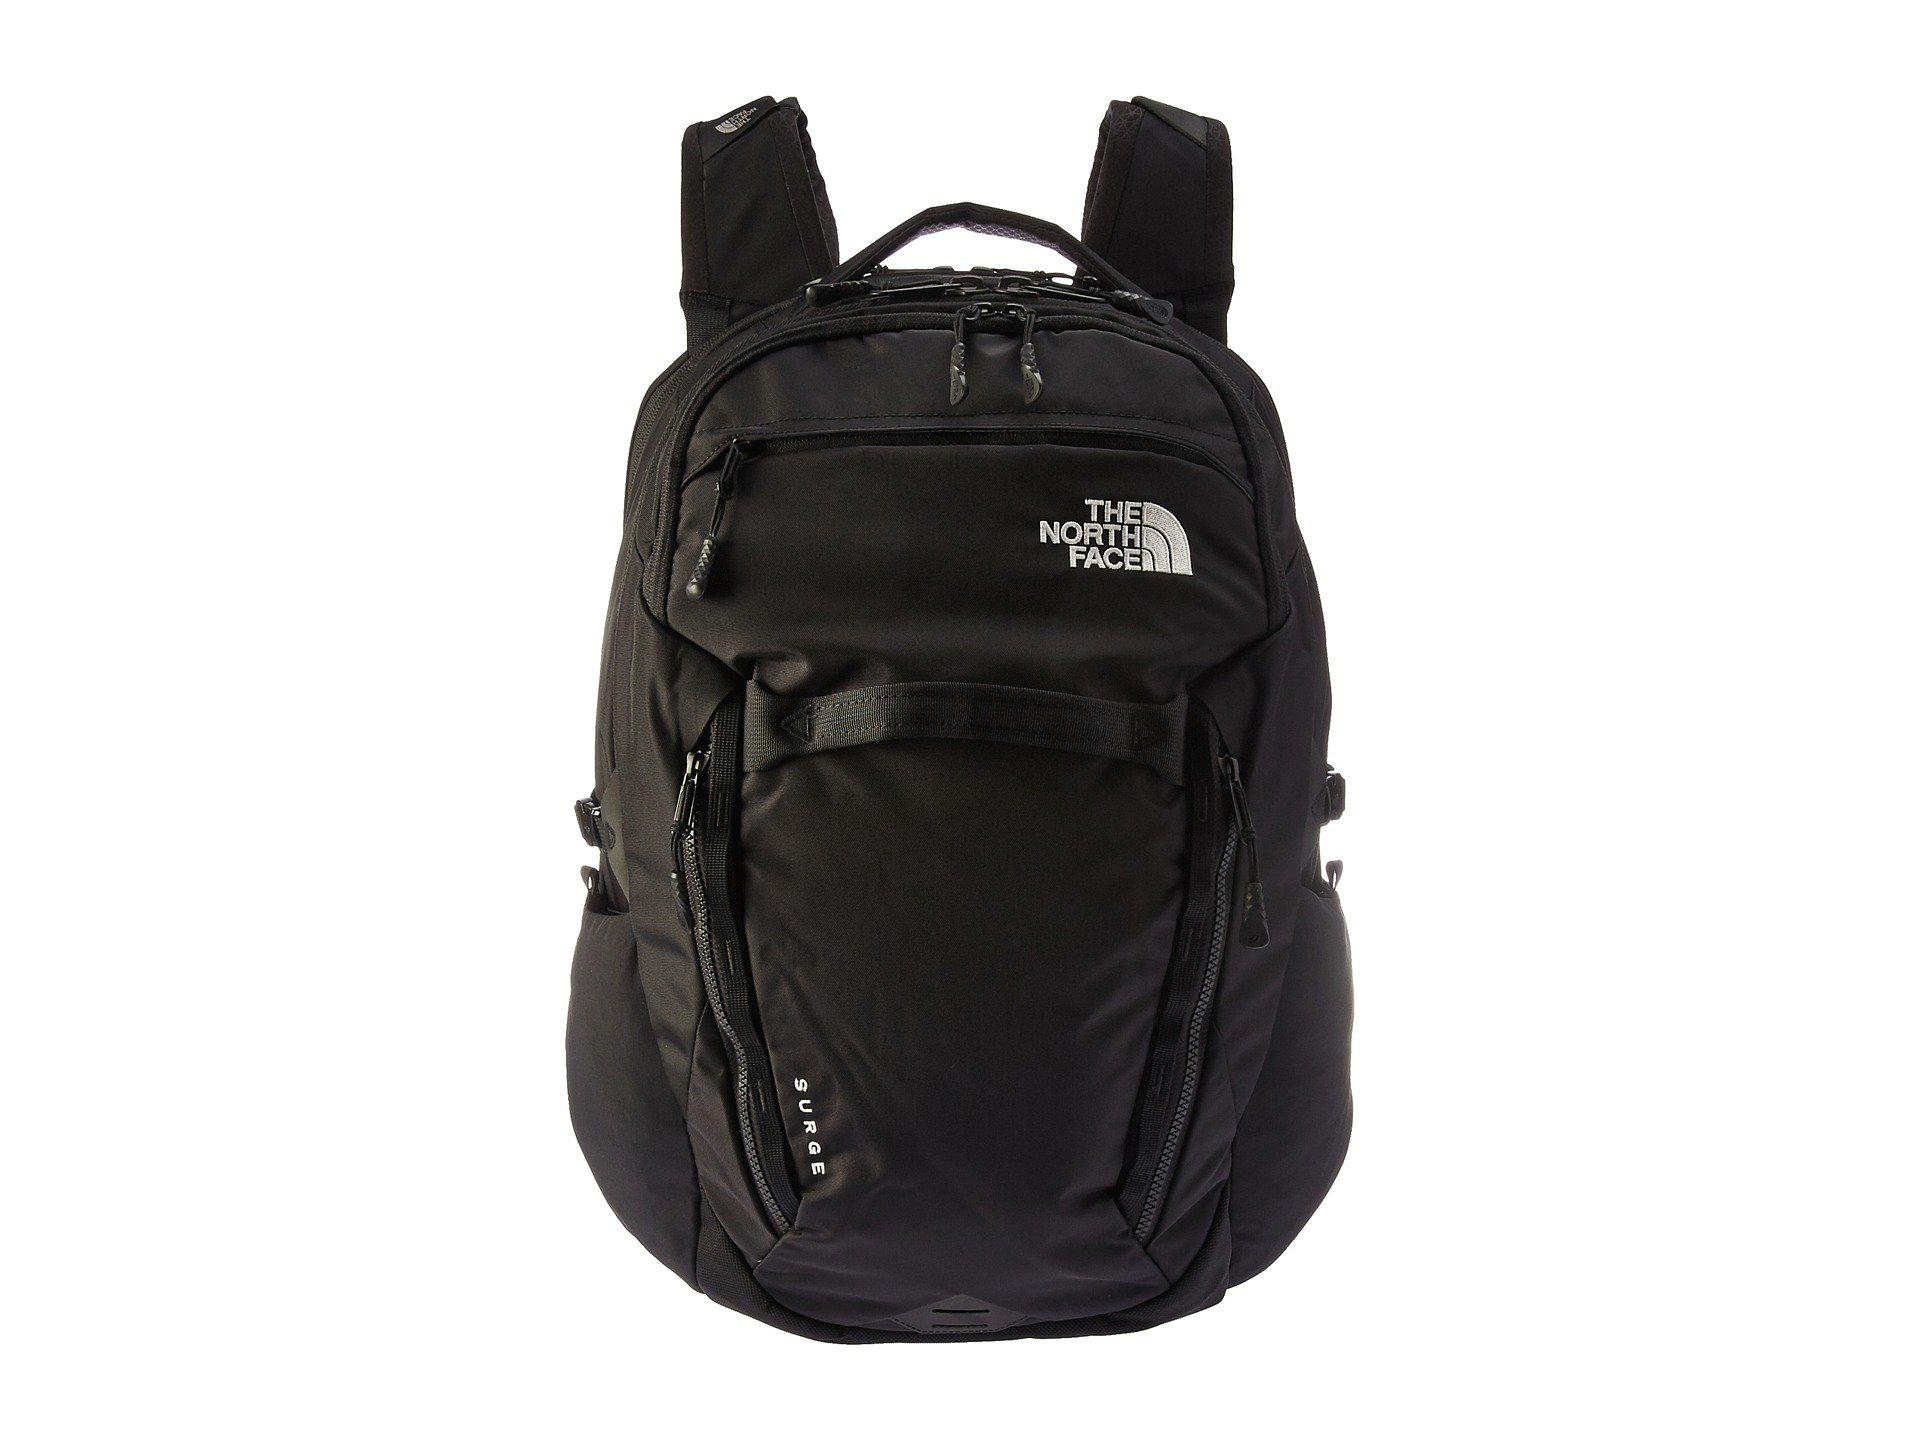 27c688b0b3a2 Lyst - The North Face Women s Surge Backpack (kokomo Green Ripstop ...